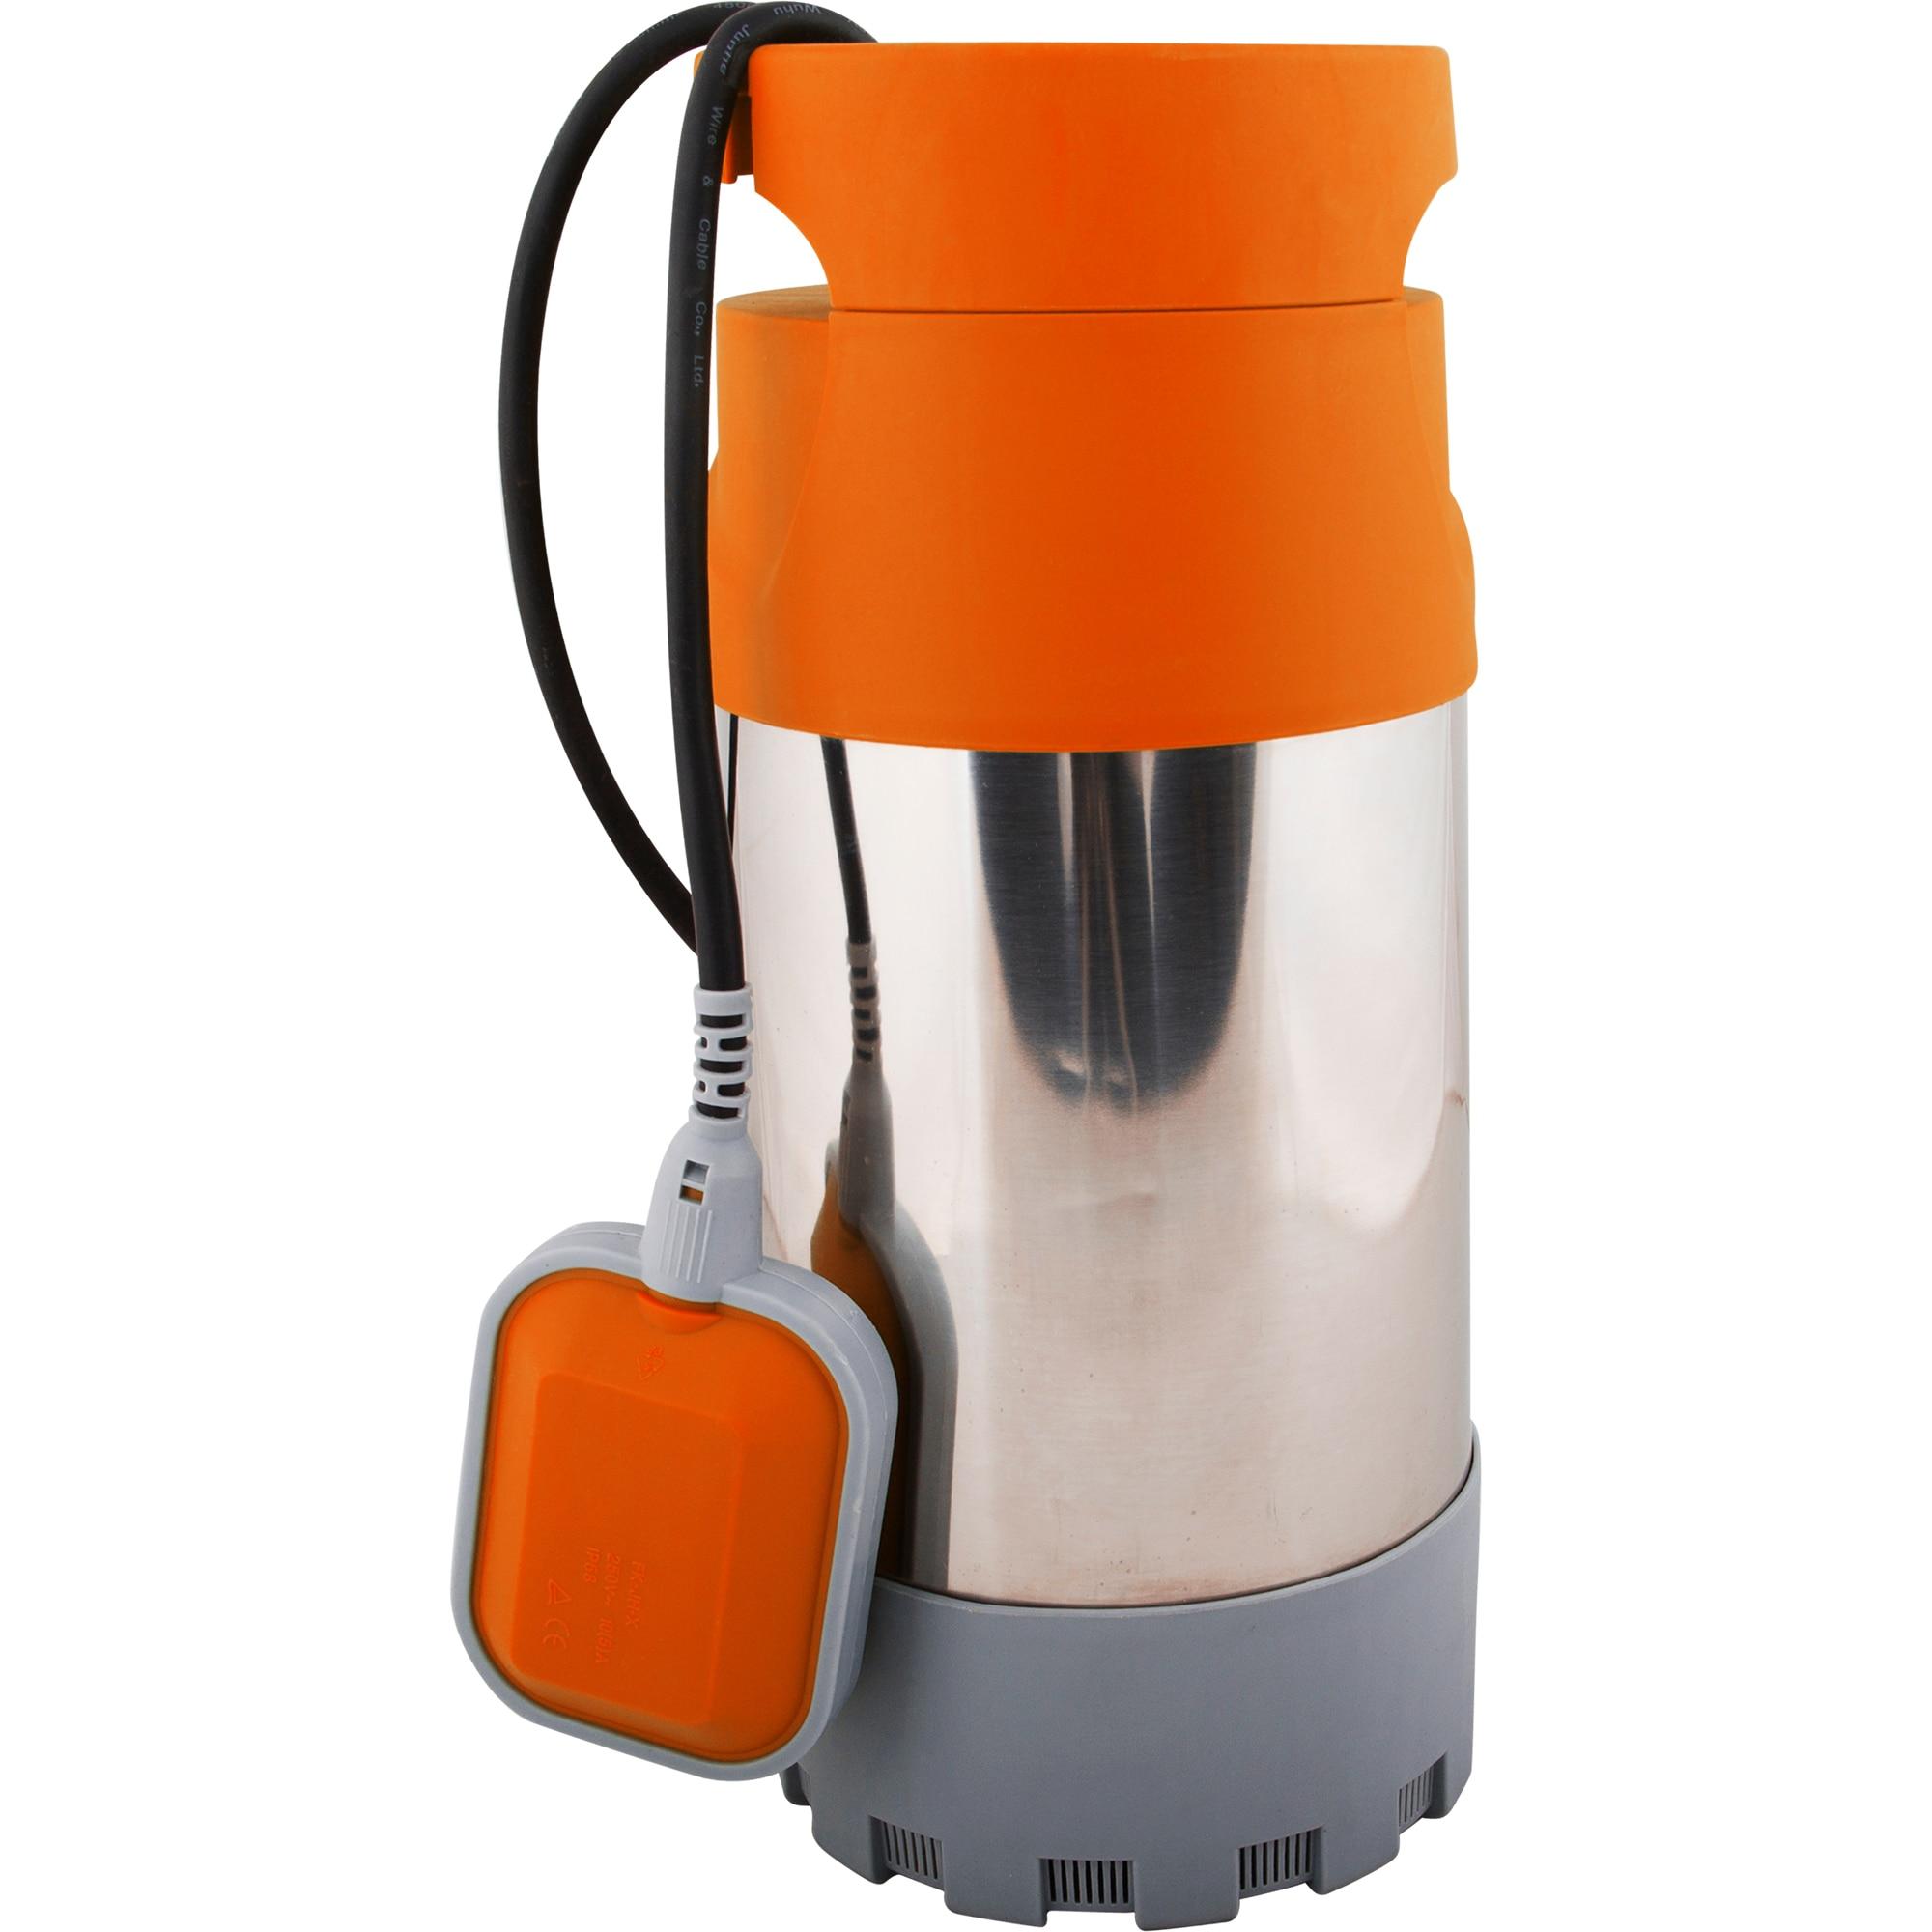 Fotografie Pompa submersibila din inox pentru apa murdara EVOTOOLS 4P-EPTO, 1000 W, 5500 l/h debit apa, 40 m inaltime refulare